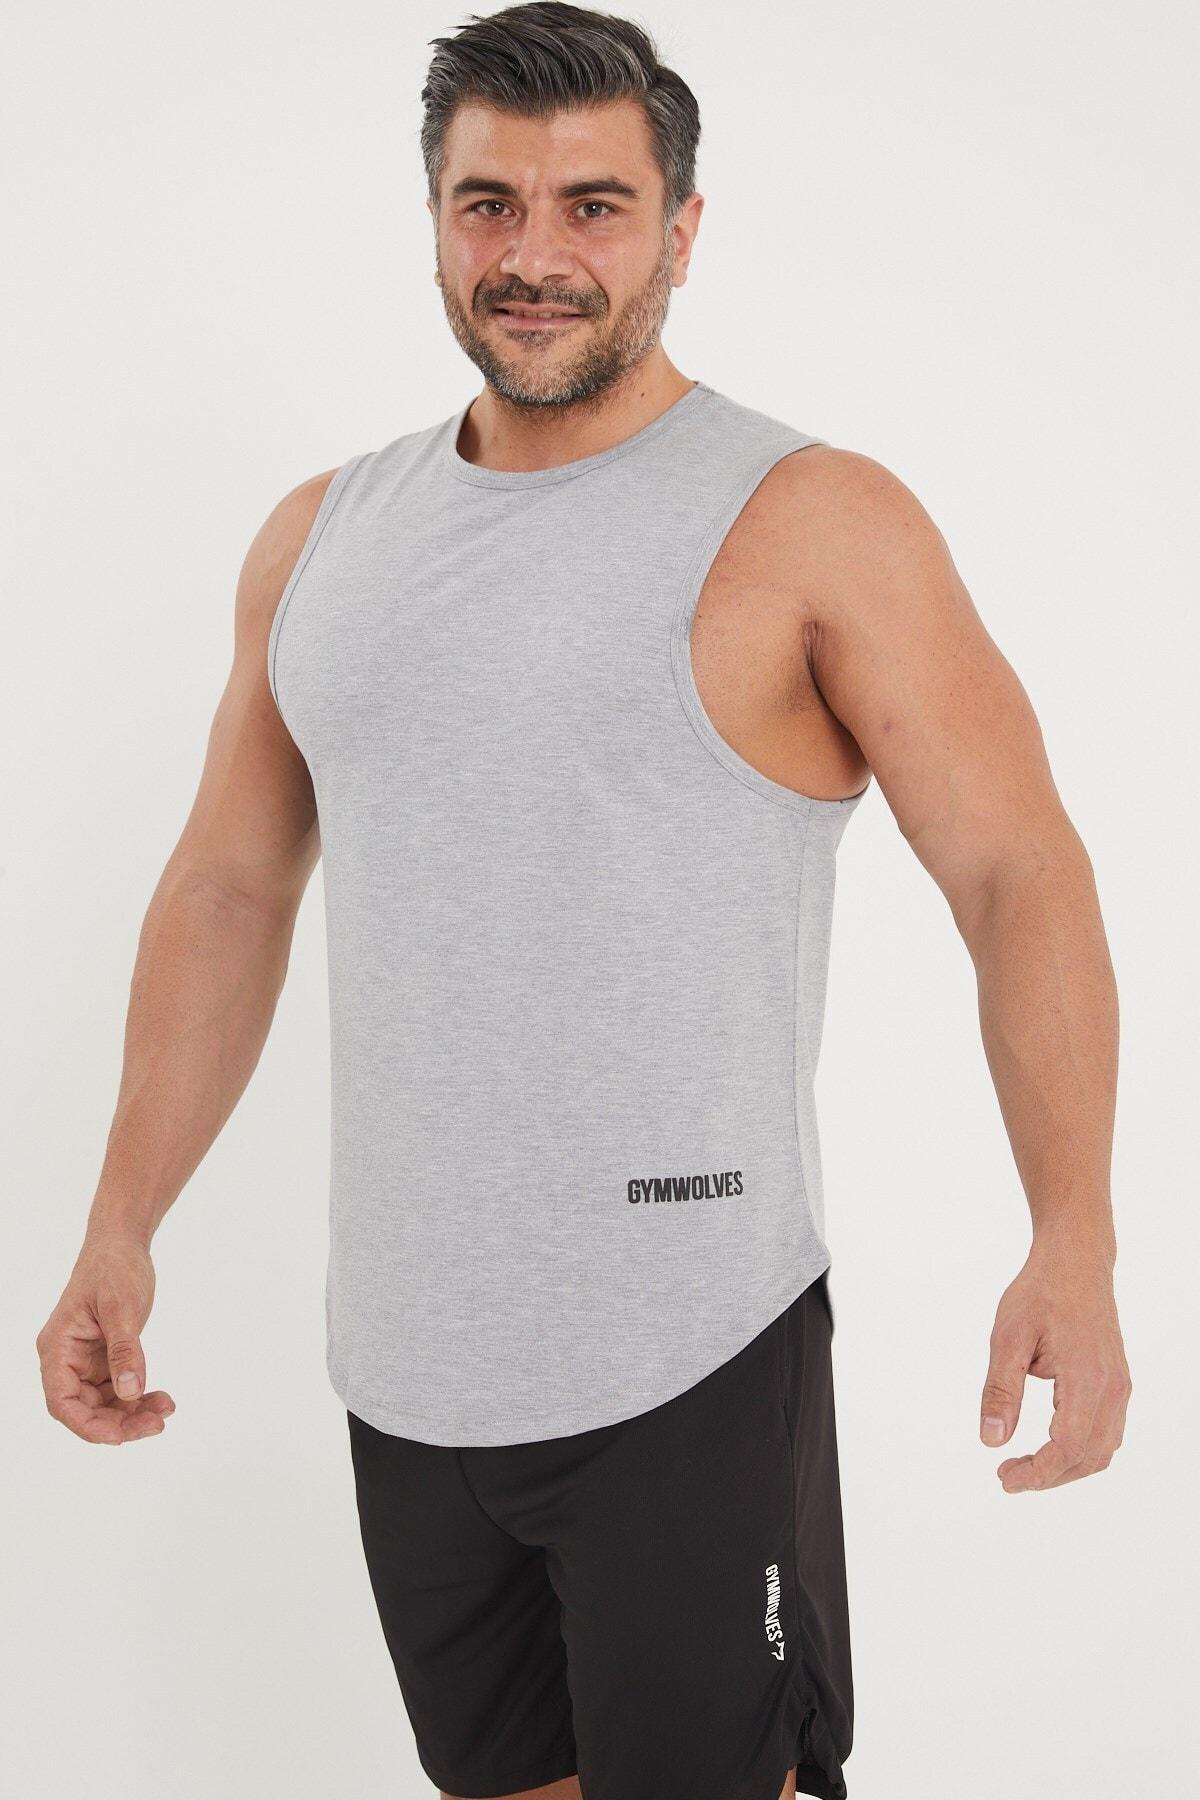 Gymwolves Erkek Kolsuz T-shirt | Gri | Erkek Spor T-shirt | Workout Tanktop | 1